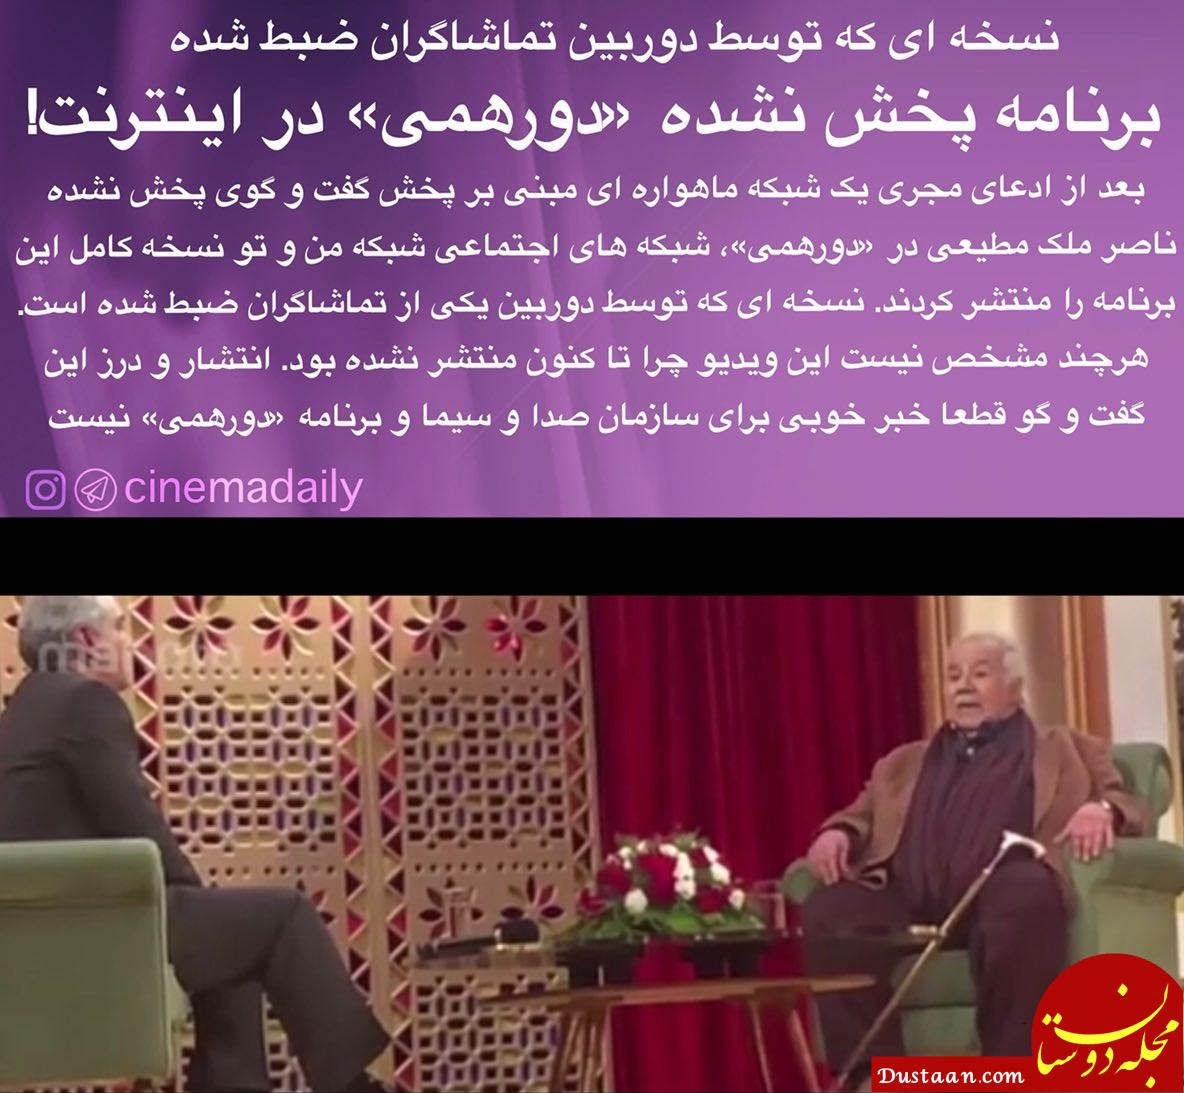 www.dustaan.com برنامه پخش نشده «دورهمی» با حضور ناصر ملک مطیعی در اینترنت منتشر شد!